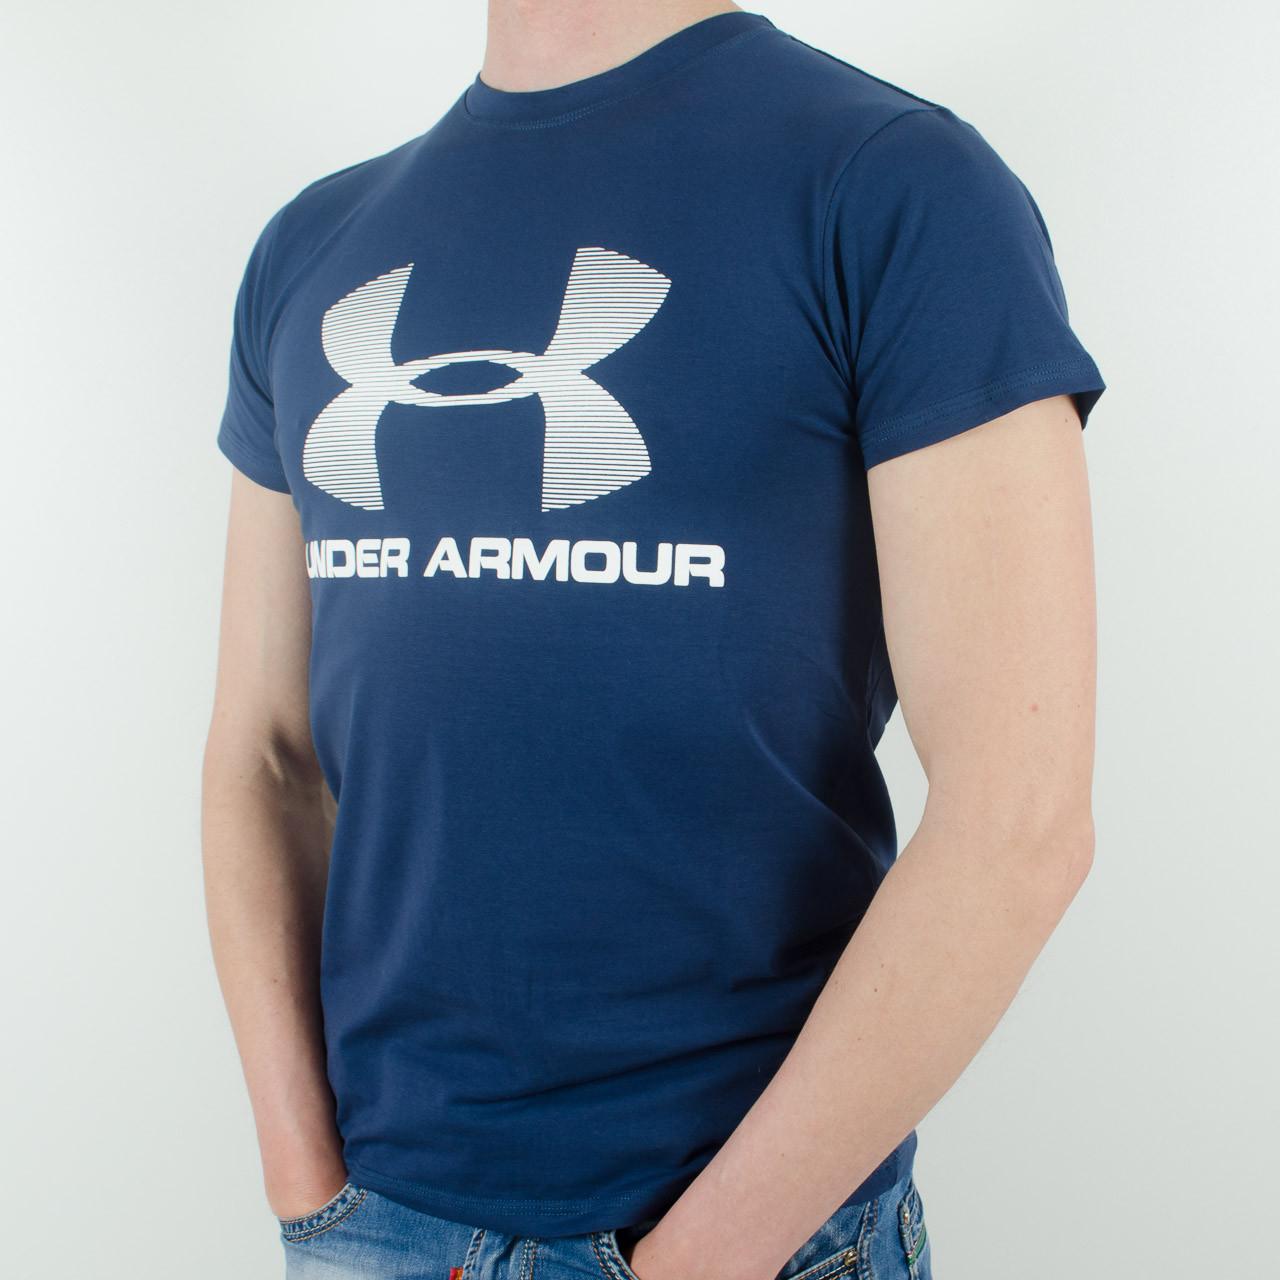 Футболка с логотипом, Under Armour (т.синий)